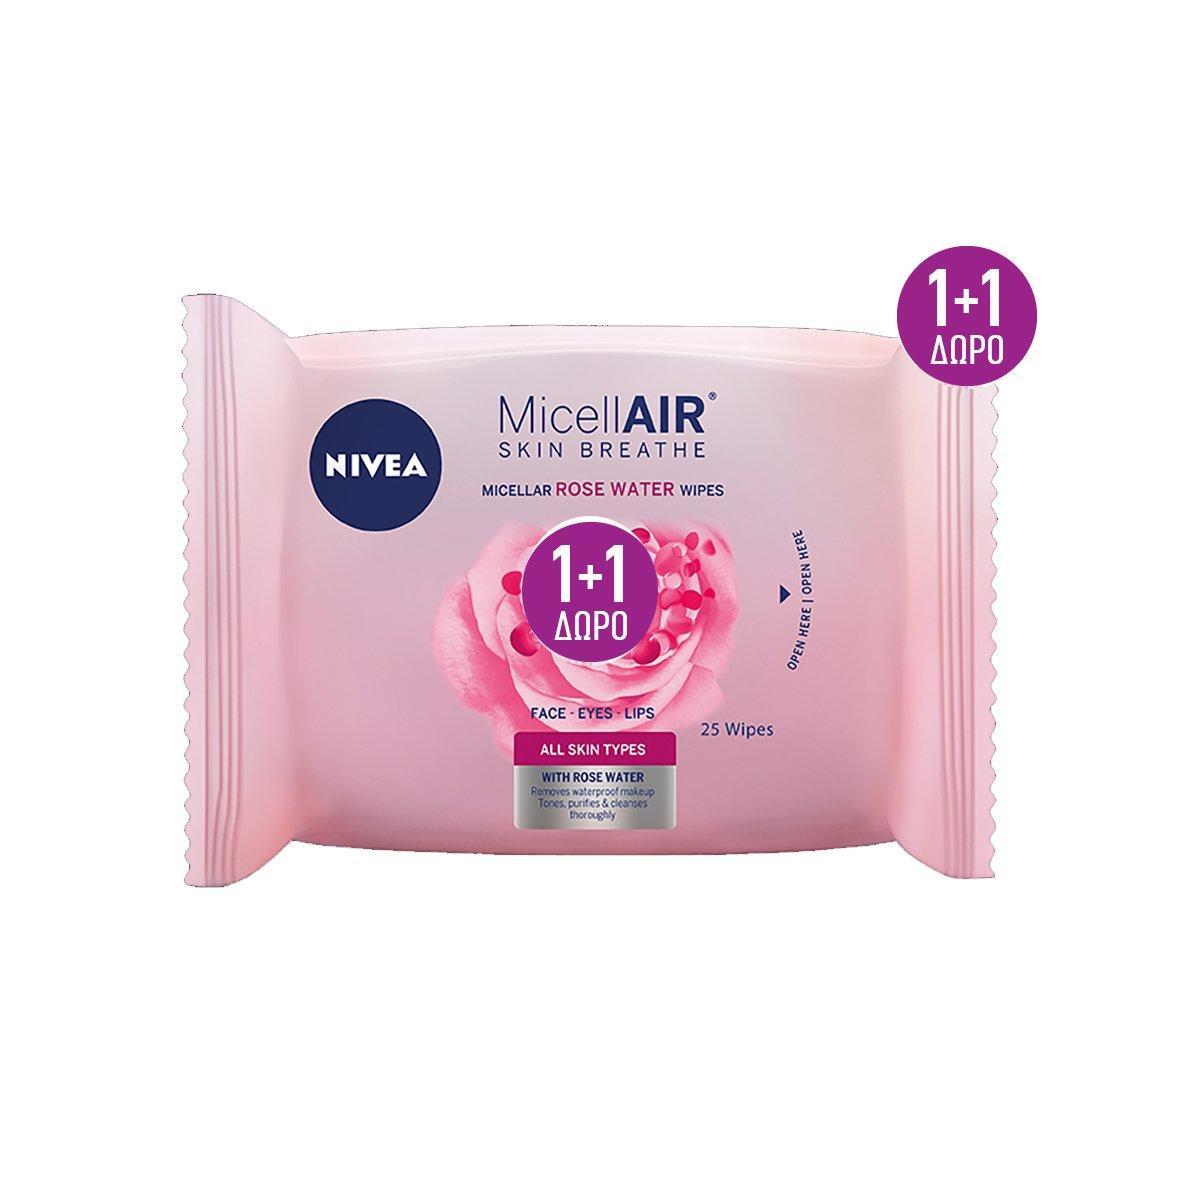 Nivea MicellAIR Skin Breathe With Rose Water Μαντηλάκια Καθαρισμού με Ροδόνερο 2×25 Τεμάχια 1+1 Δώρο